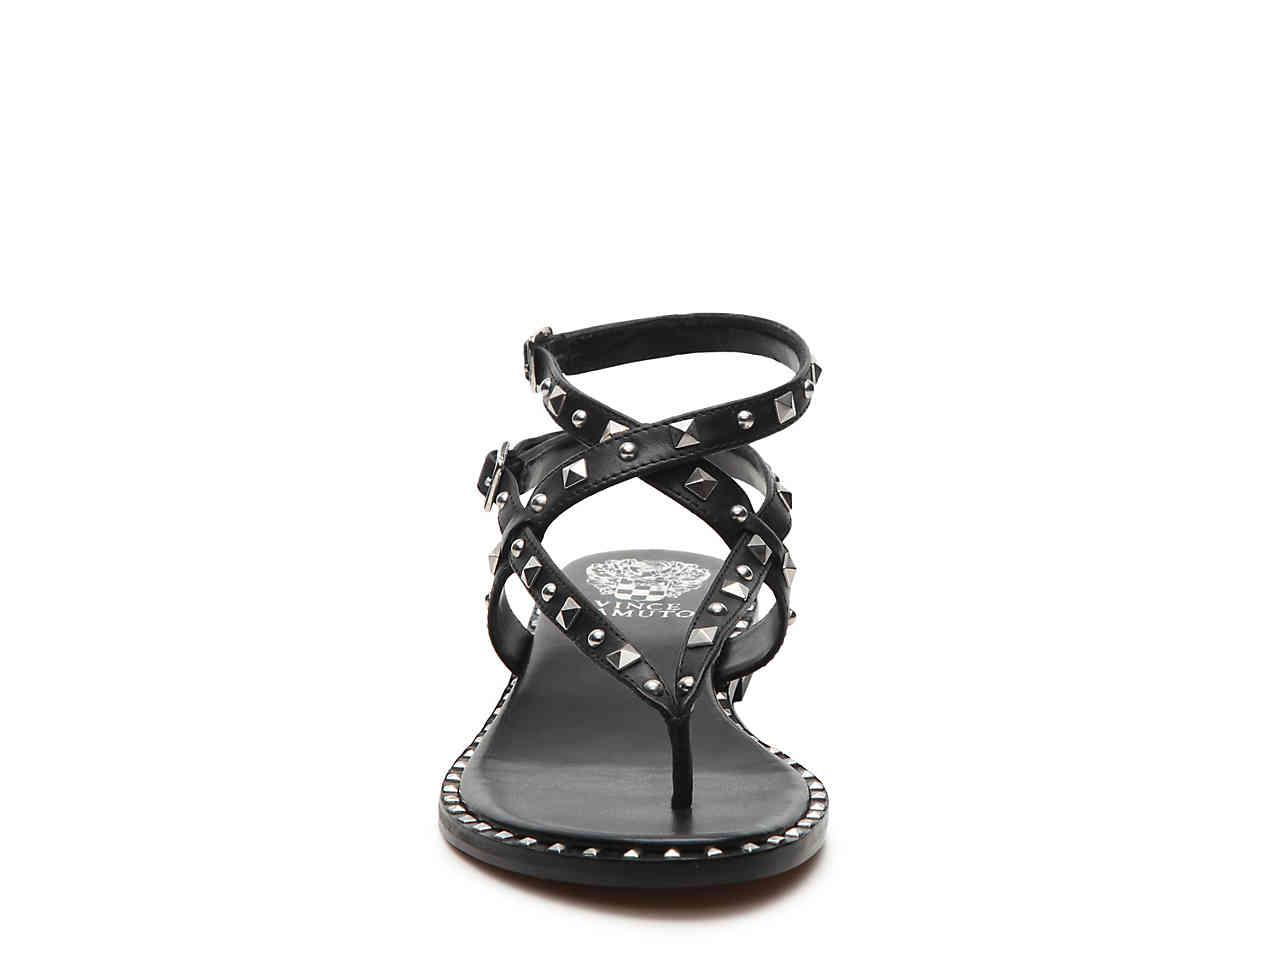 ba7b8ccc95a Lyst - Vince Camuto Jaxien Sandal in Black